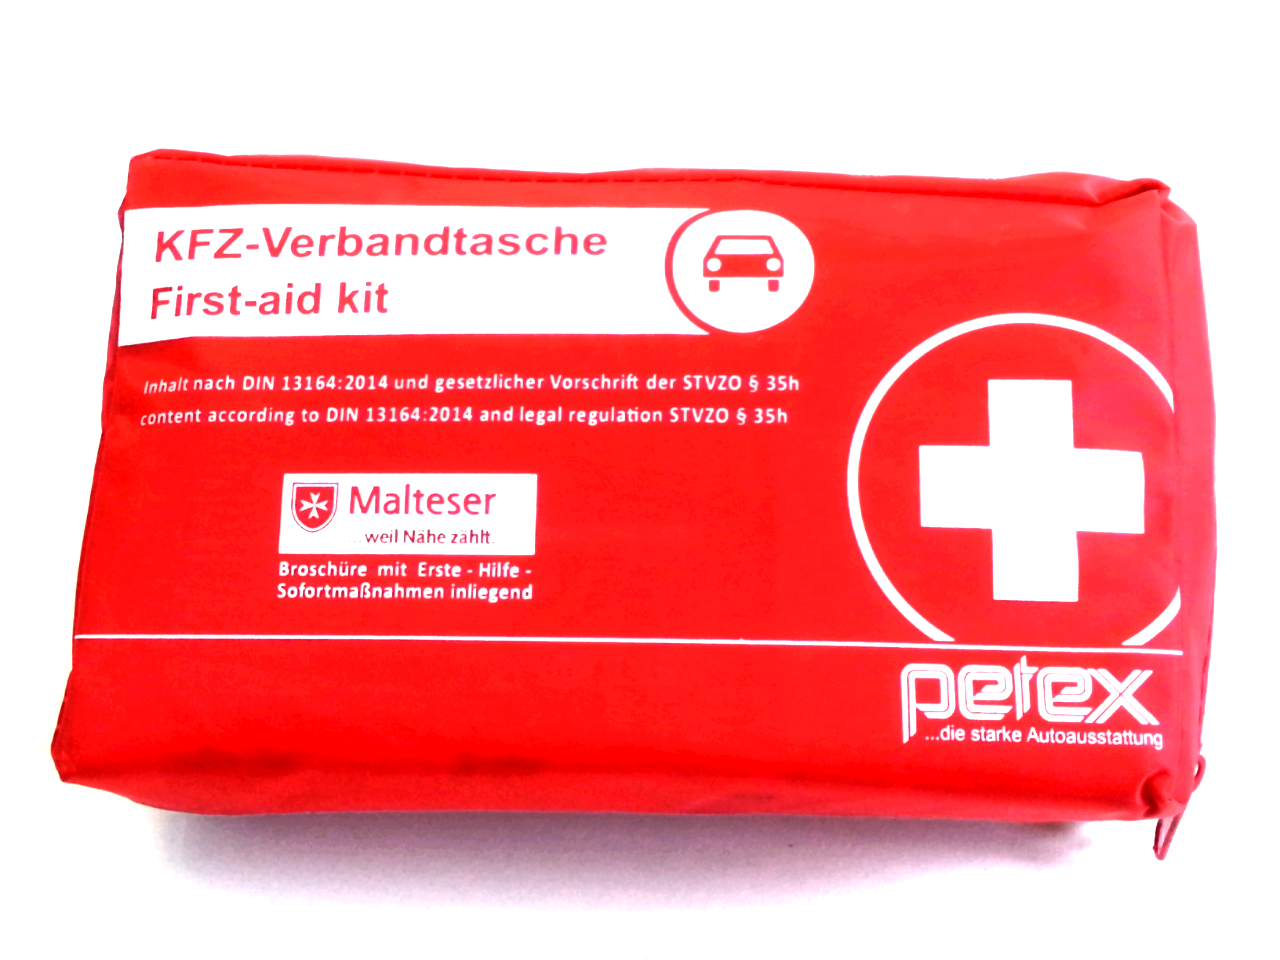 Petex KFZ Verbandstasche Verbandtasche Verbandskiste rot DIN 13164:2014